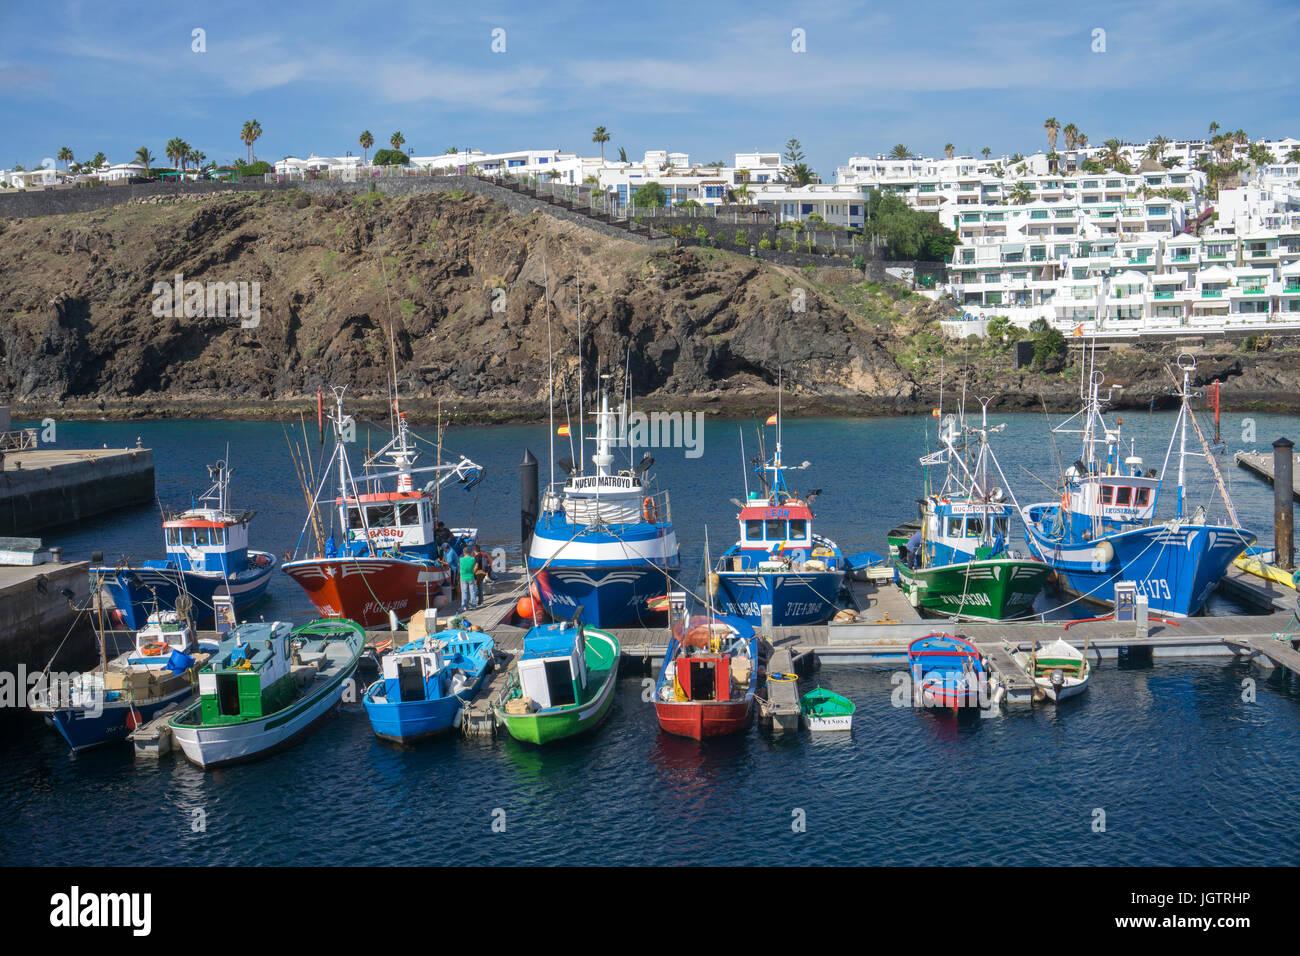 Fishing harbour La Tinosa at Puerto del Carmen, Lanzarote island, Canary islands, Spain, Europe - Stock Image